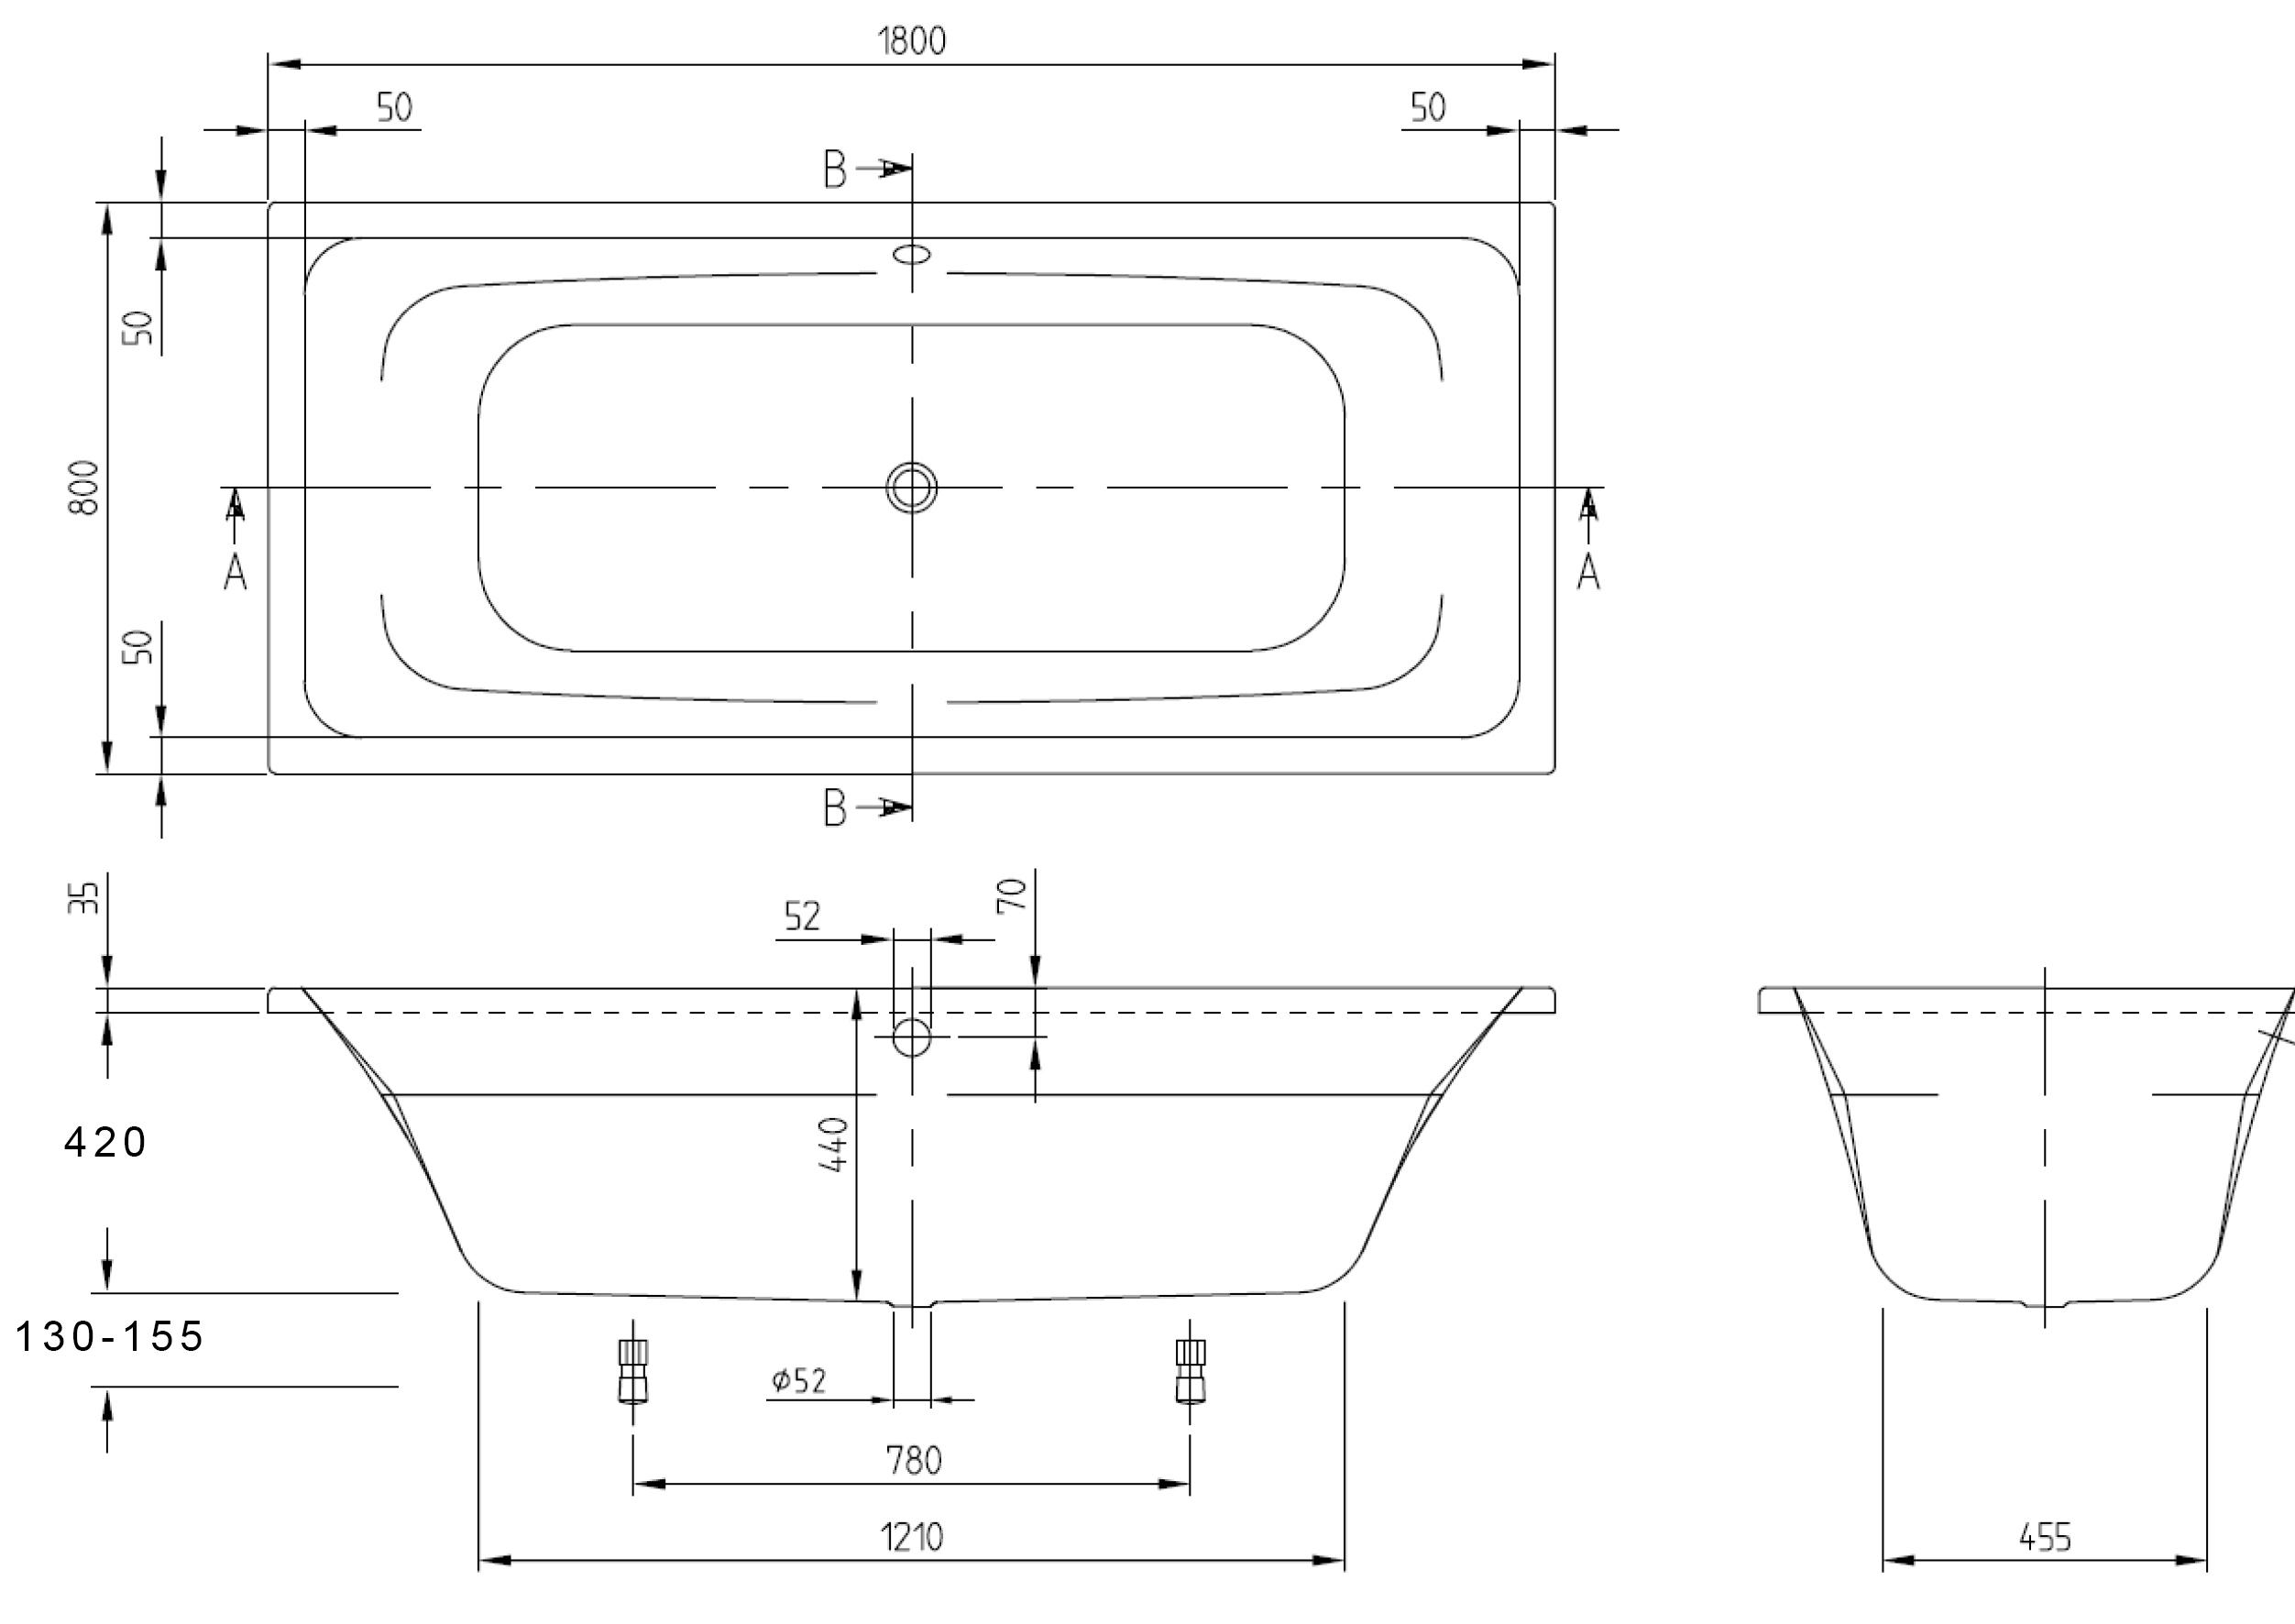 Targa Bath 1800 x 800 w/- OF